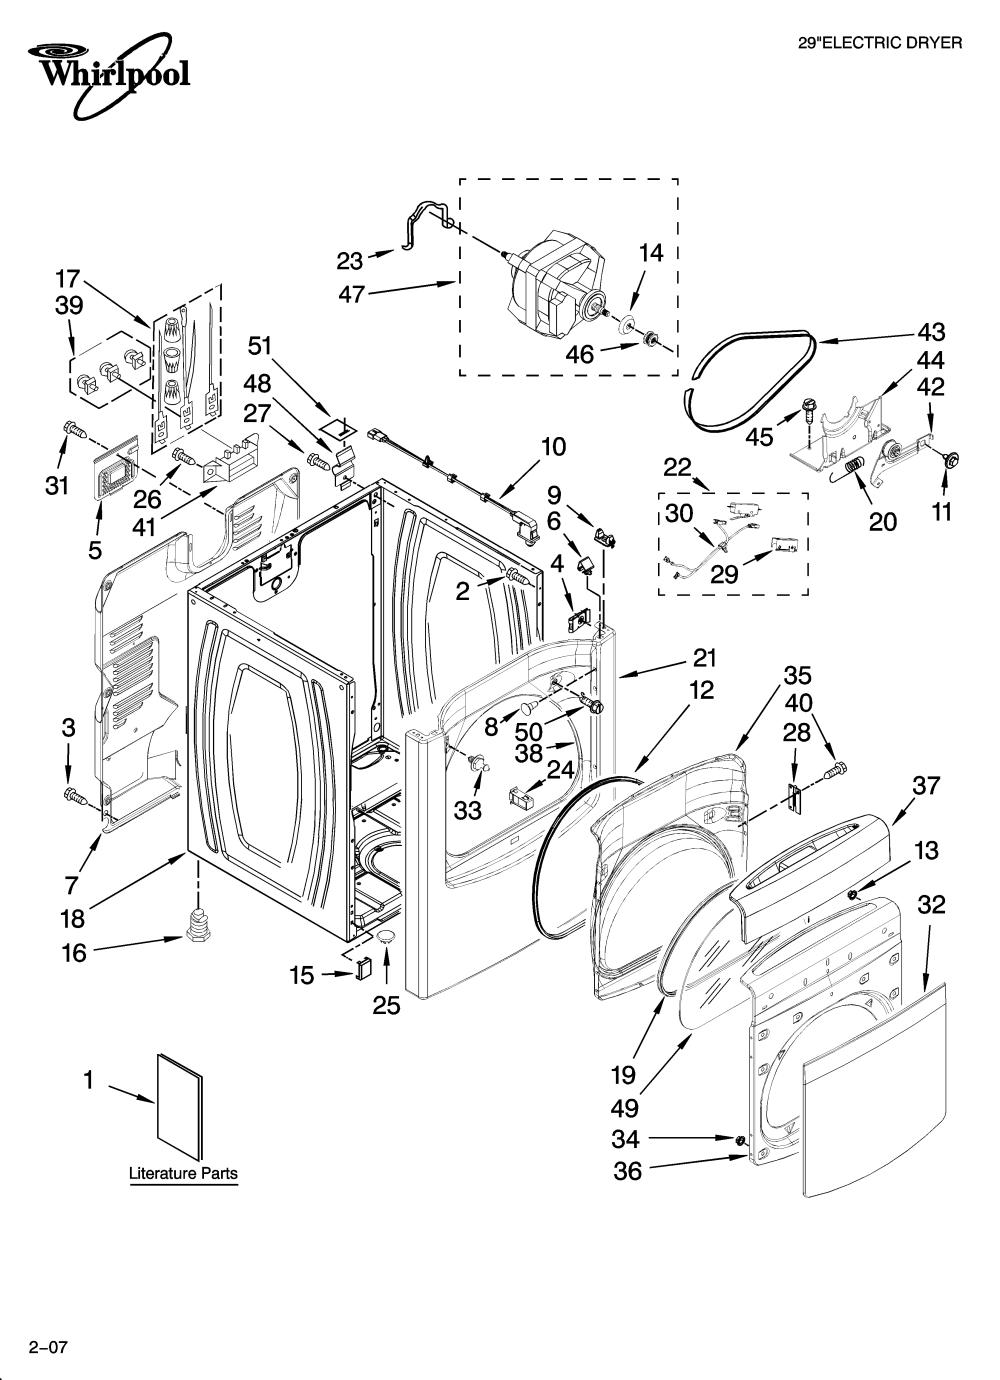 medium resolution of looking for whirlpool model wed6400sw1 dryer repair replacement parts diagram further whirlpool cabrio dryer parts diagram on cabrio dryer